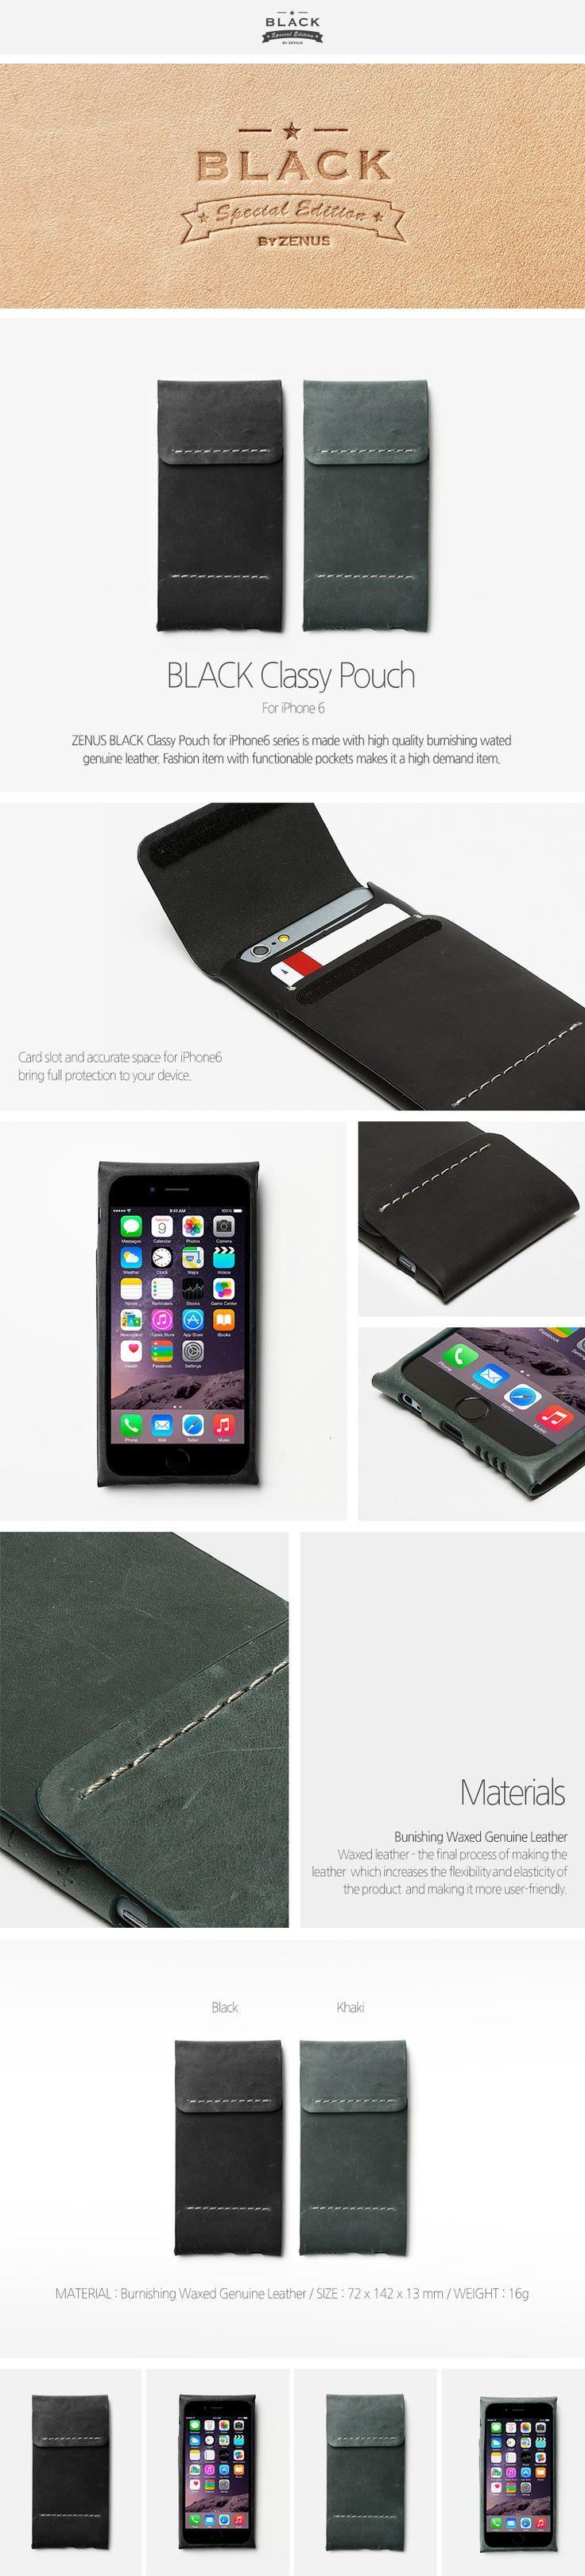 iPhone 6 Cases – www.ATREE4U.com